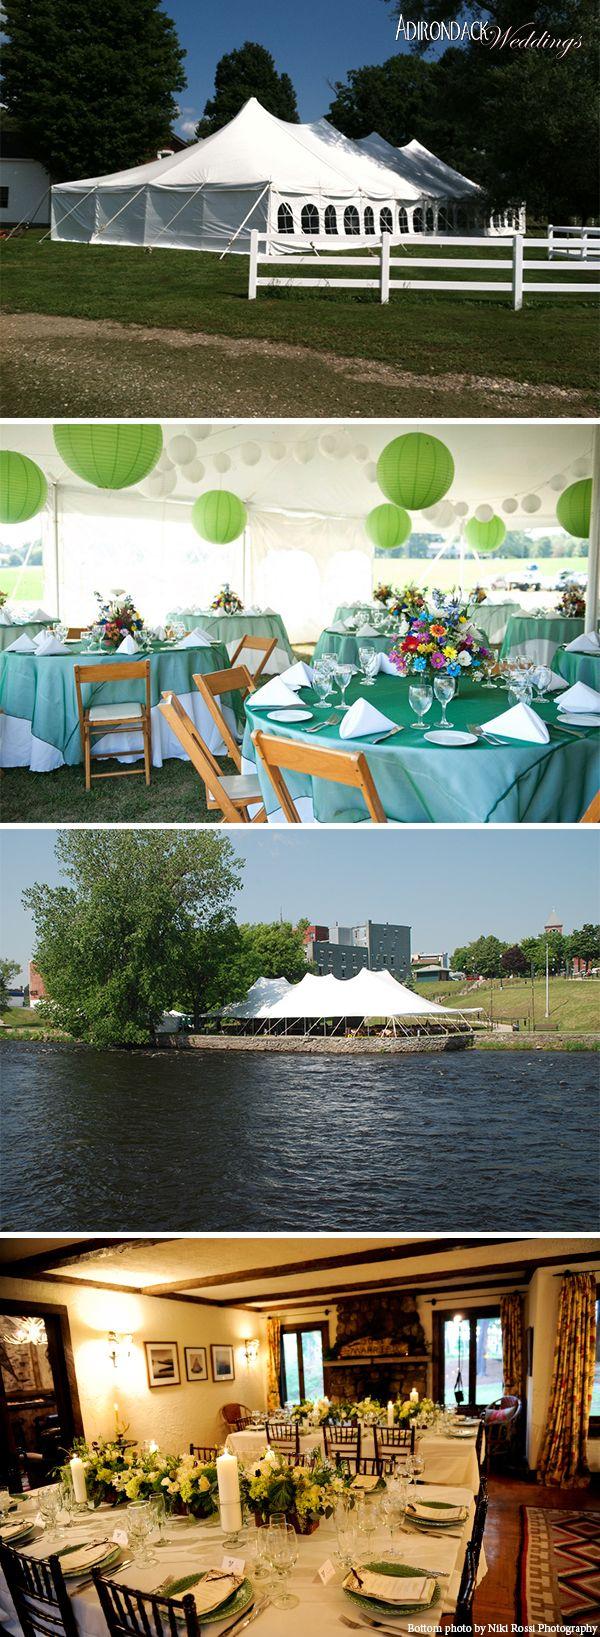 Fosters Tent Rentals Adirondack Weddings Magazine